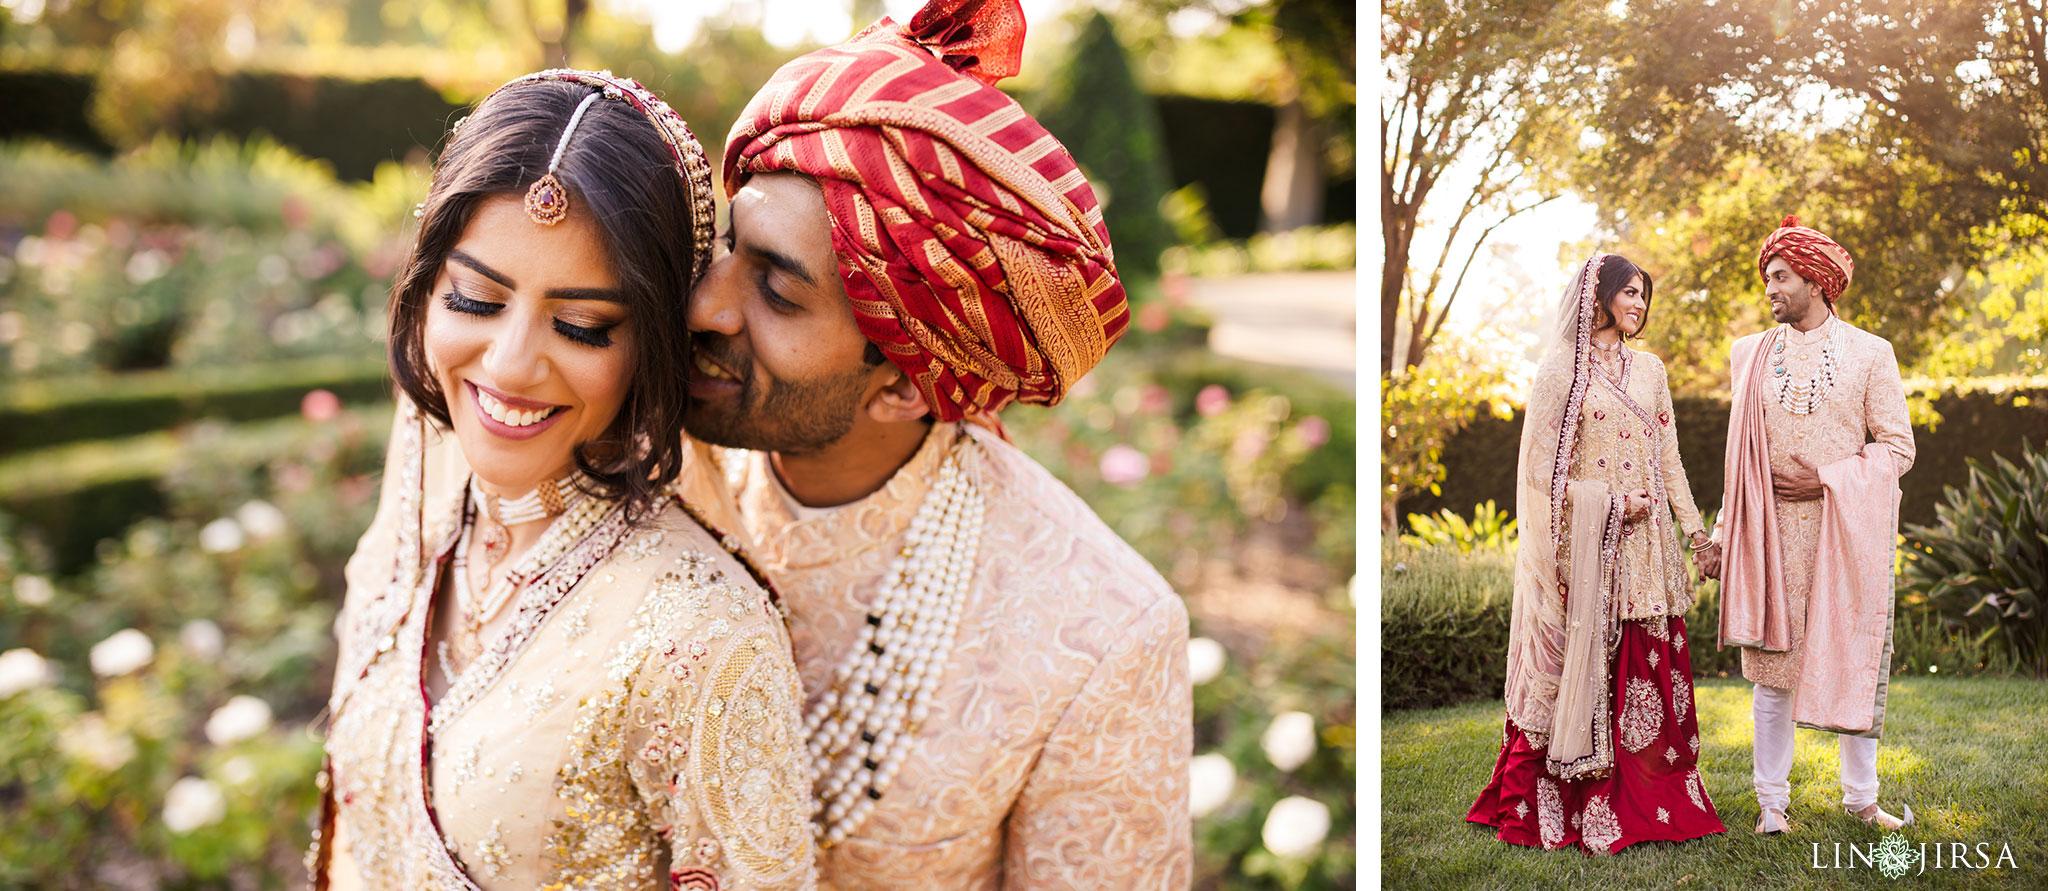 012 four seasons westlake village muslim wedding photography